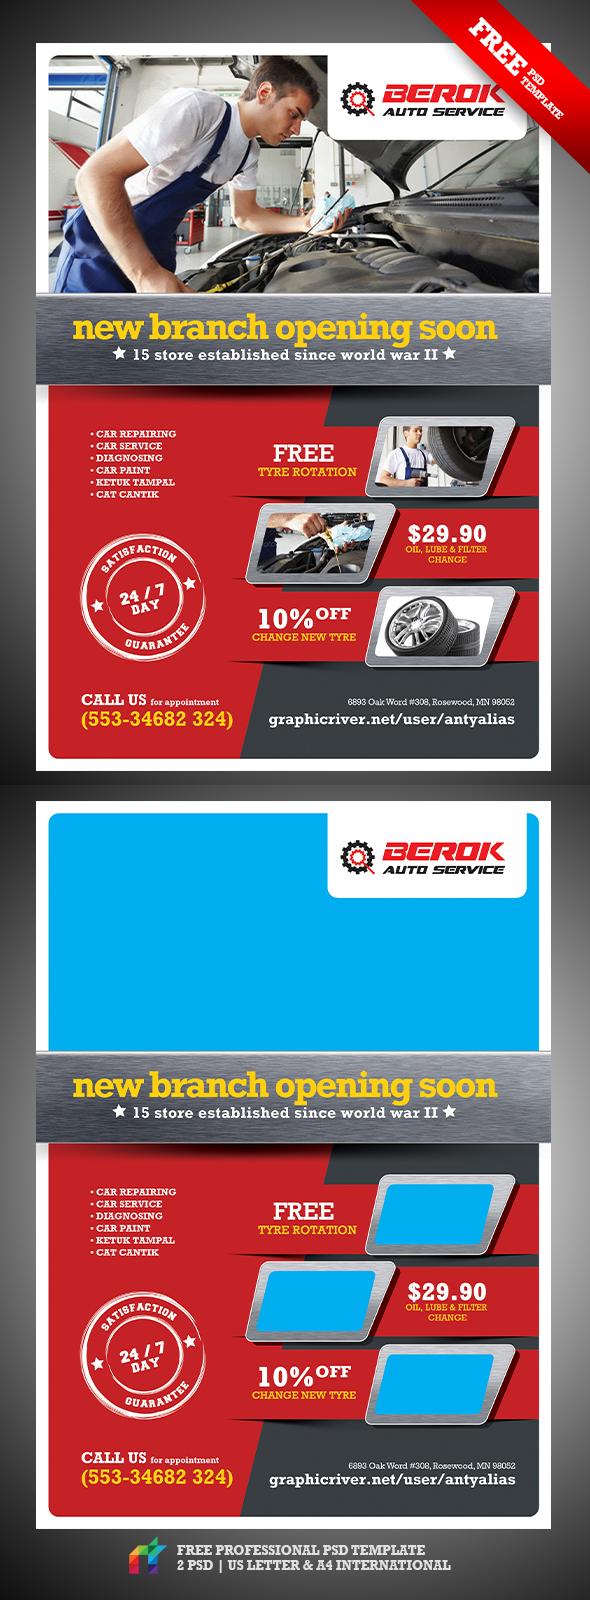 berok auto services psd flyer bies on behance